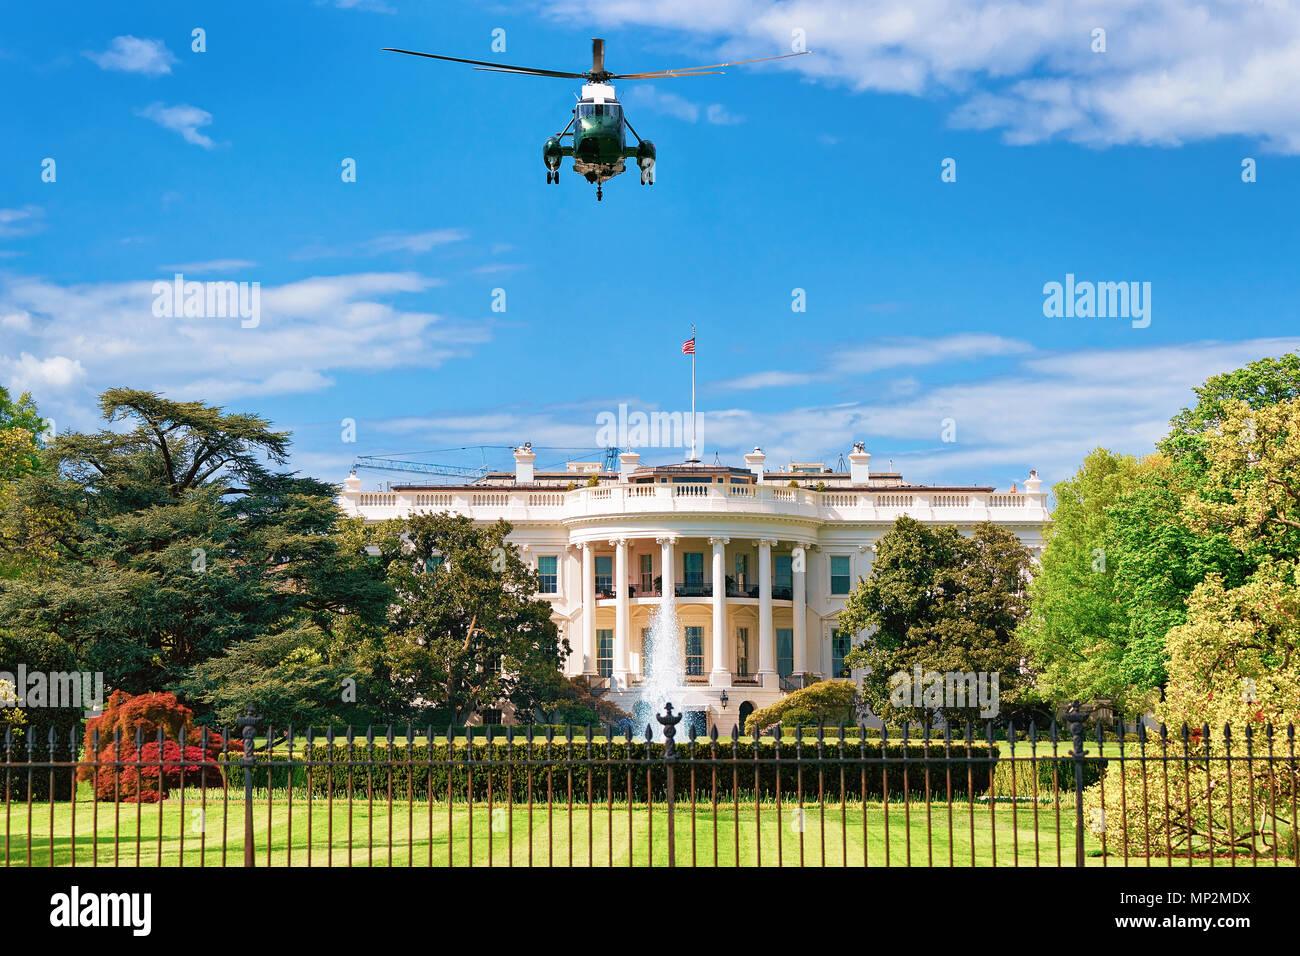 Helicopter Flight Towards The White House In Washington Dc Usa